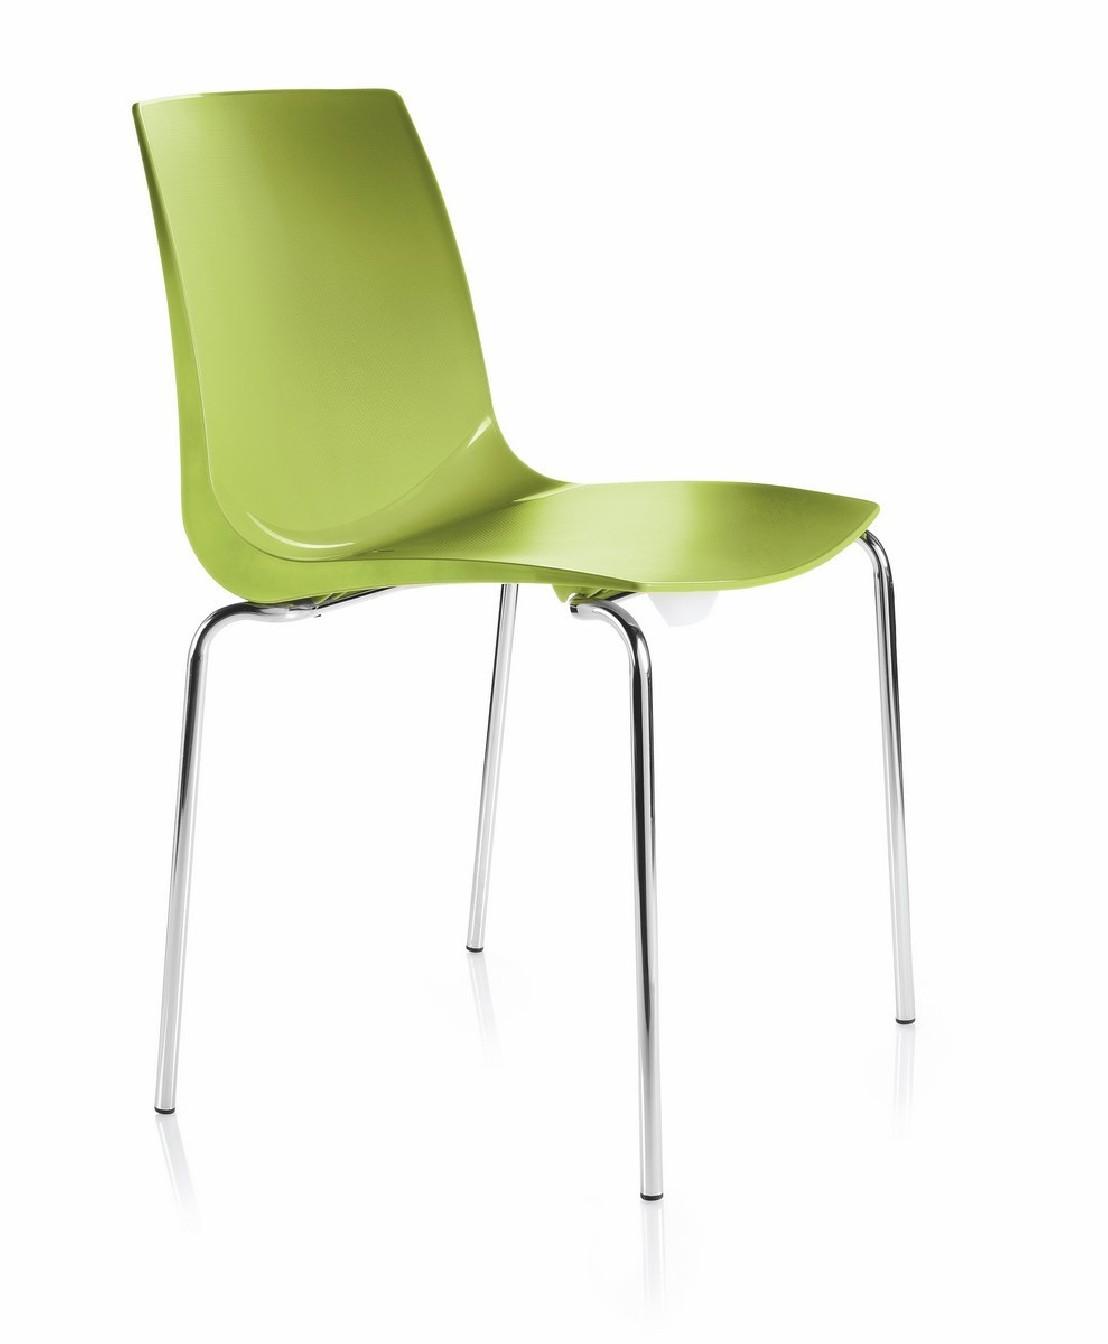 chaises r union sally coque polypropyl ne lot de 6 seanroyale. Black Bedroom Furniture Sets. Home Design Ideas